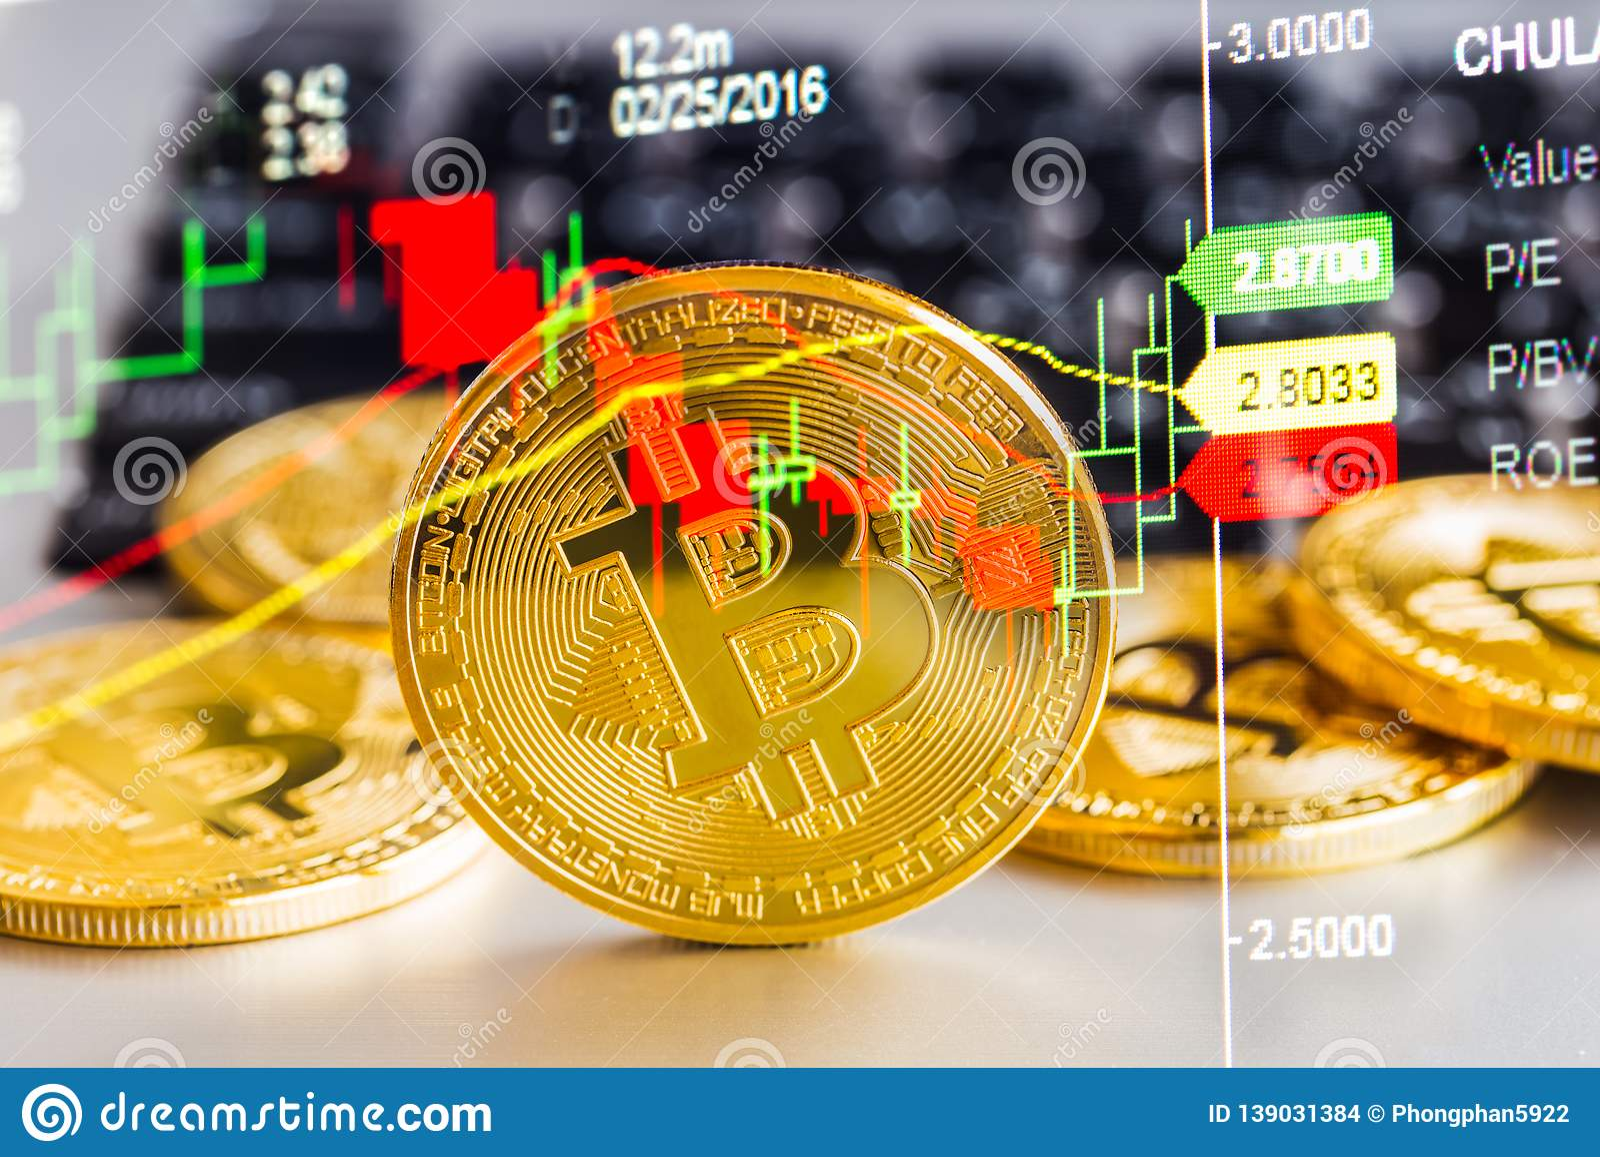 Modern Way Of Exchange. Bitcoin Is Convenient Payment In ...